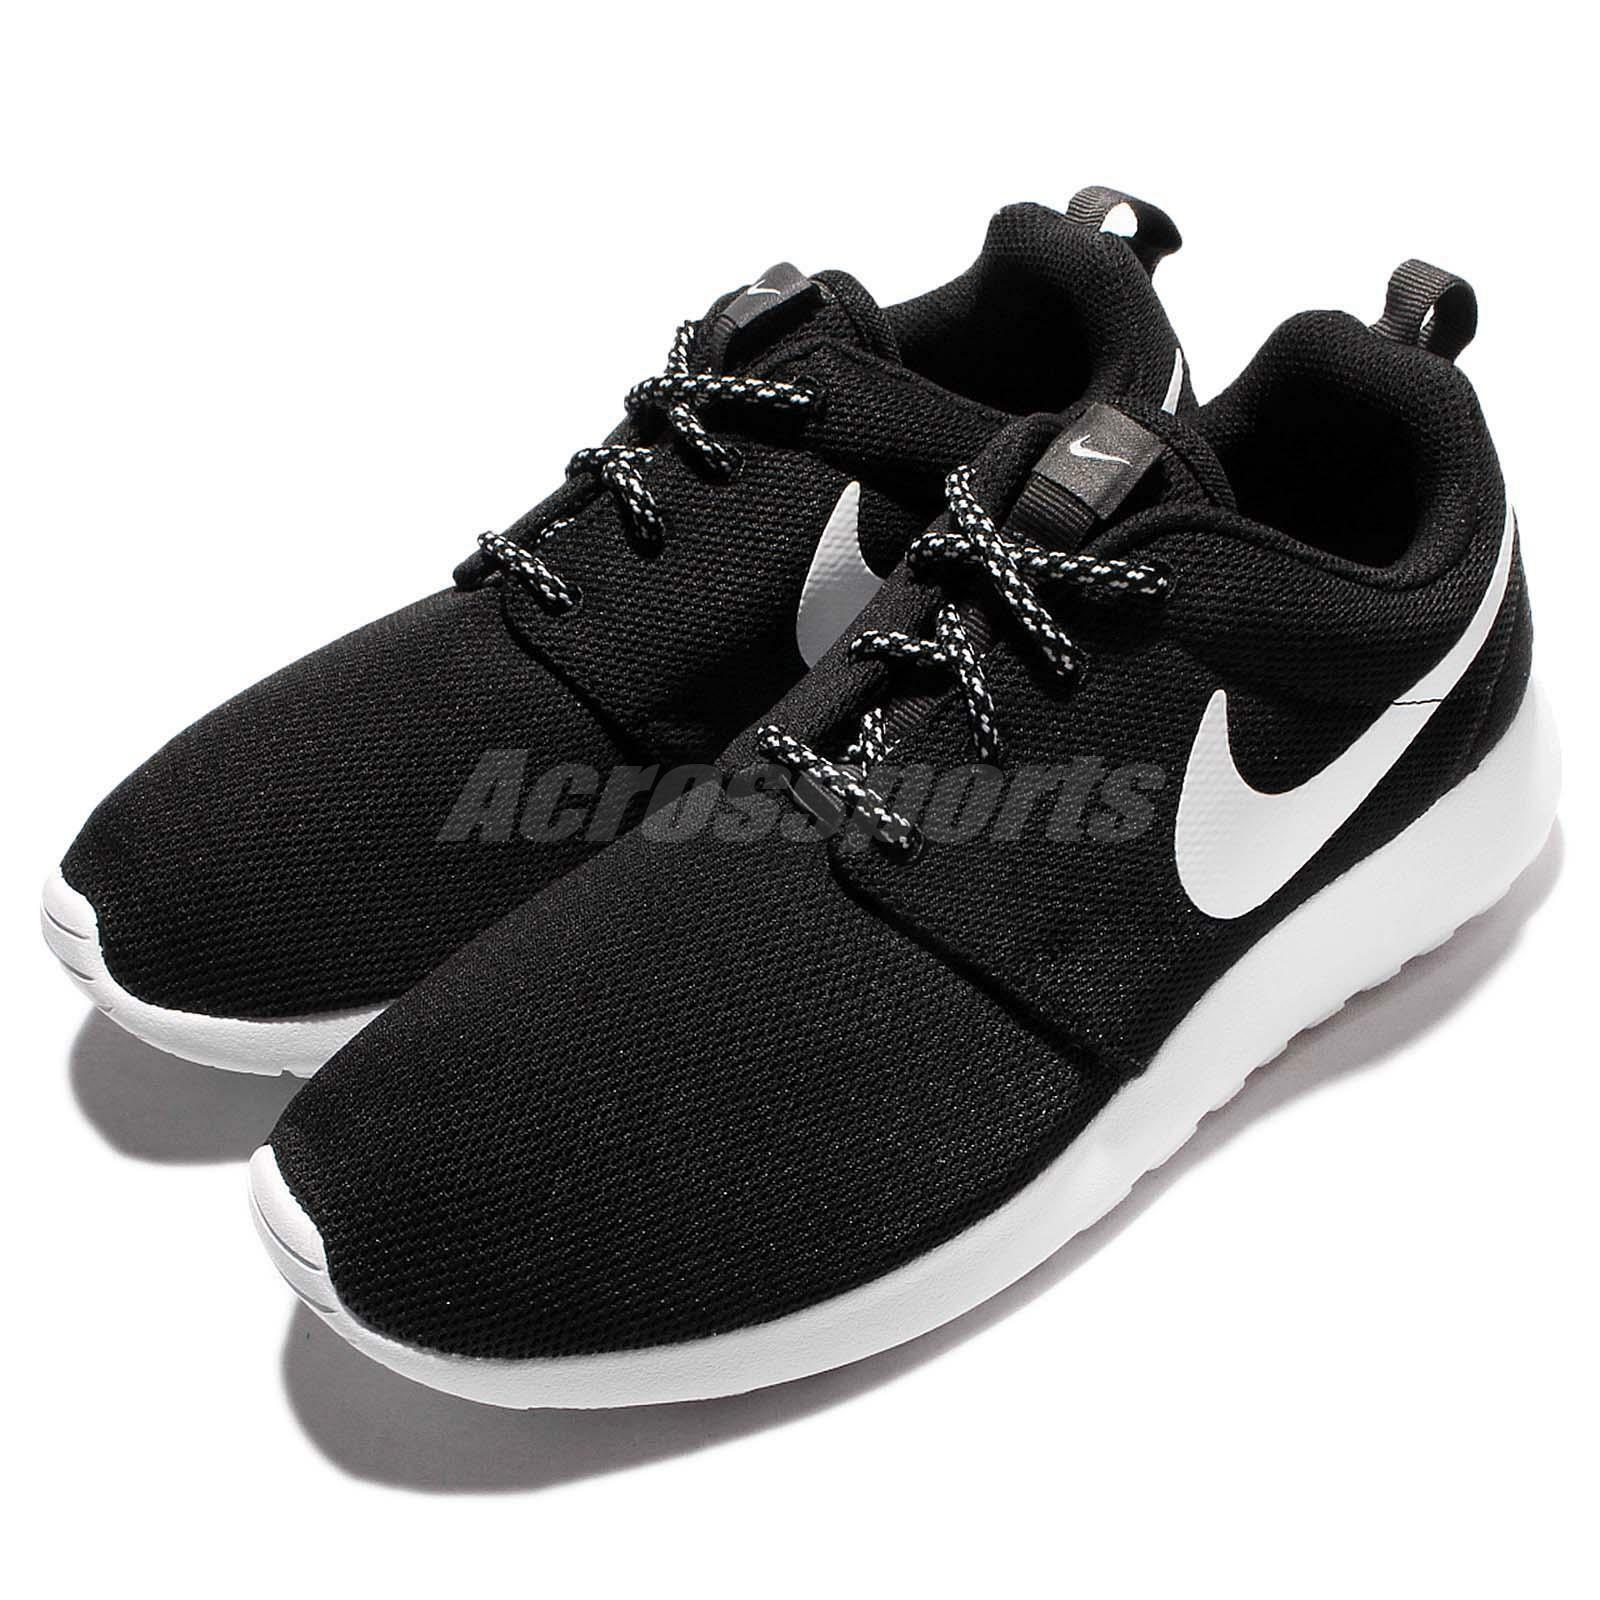 Wmns Nike Running Roshe One Black White Rosherun Women Running Nike Shoes Sneakers 844994-002 9a4838